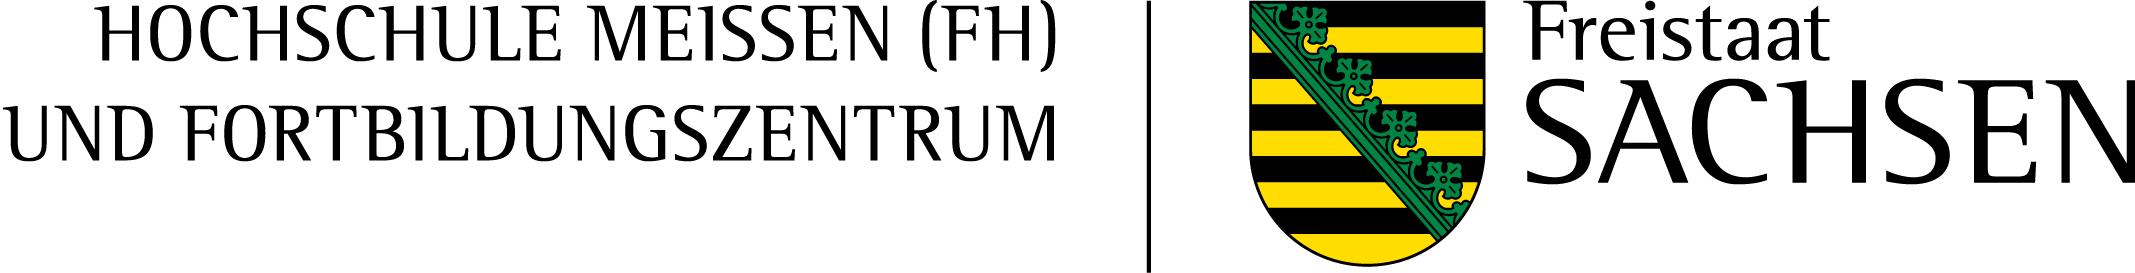 logo FHSV